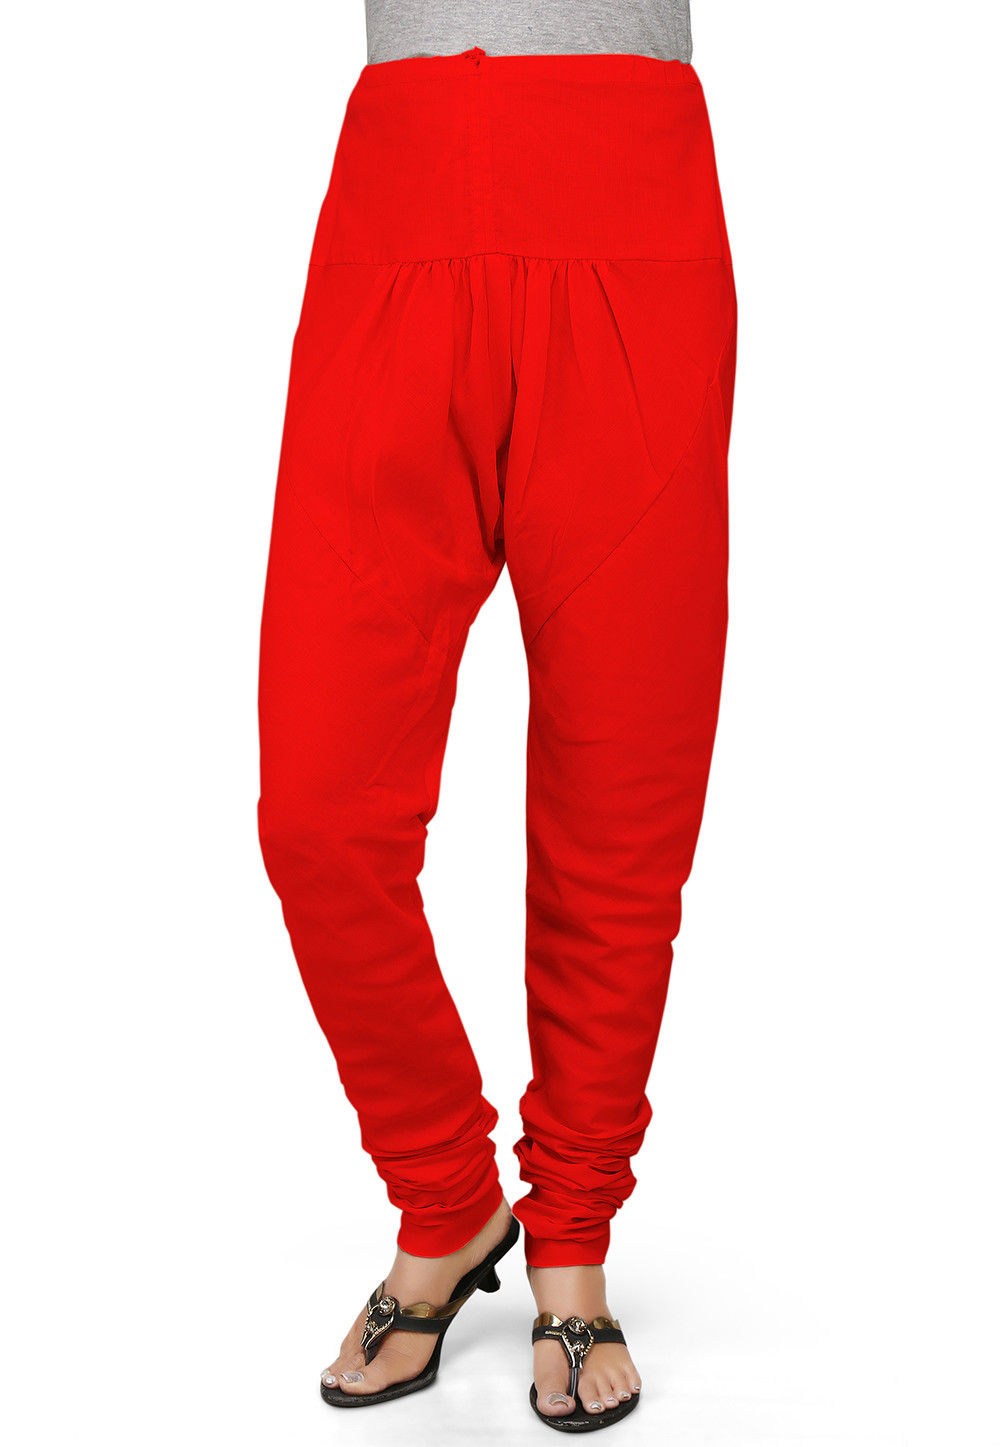 Plain Cotton Churidar in Red